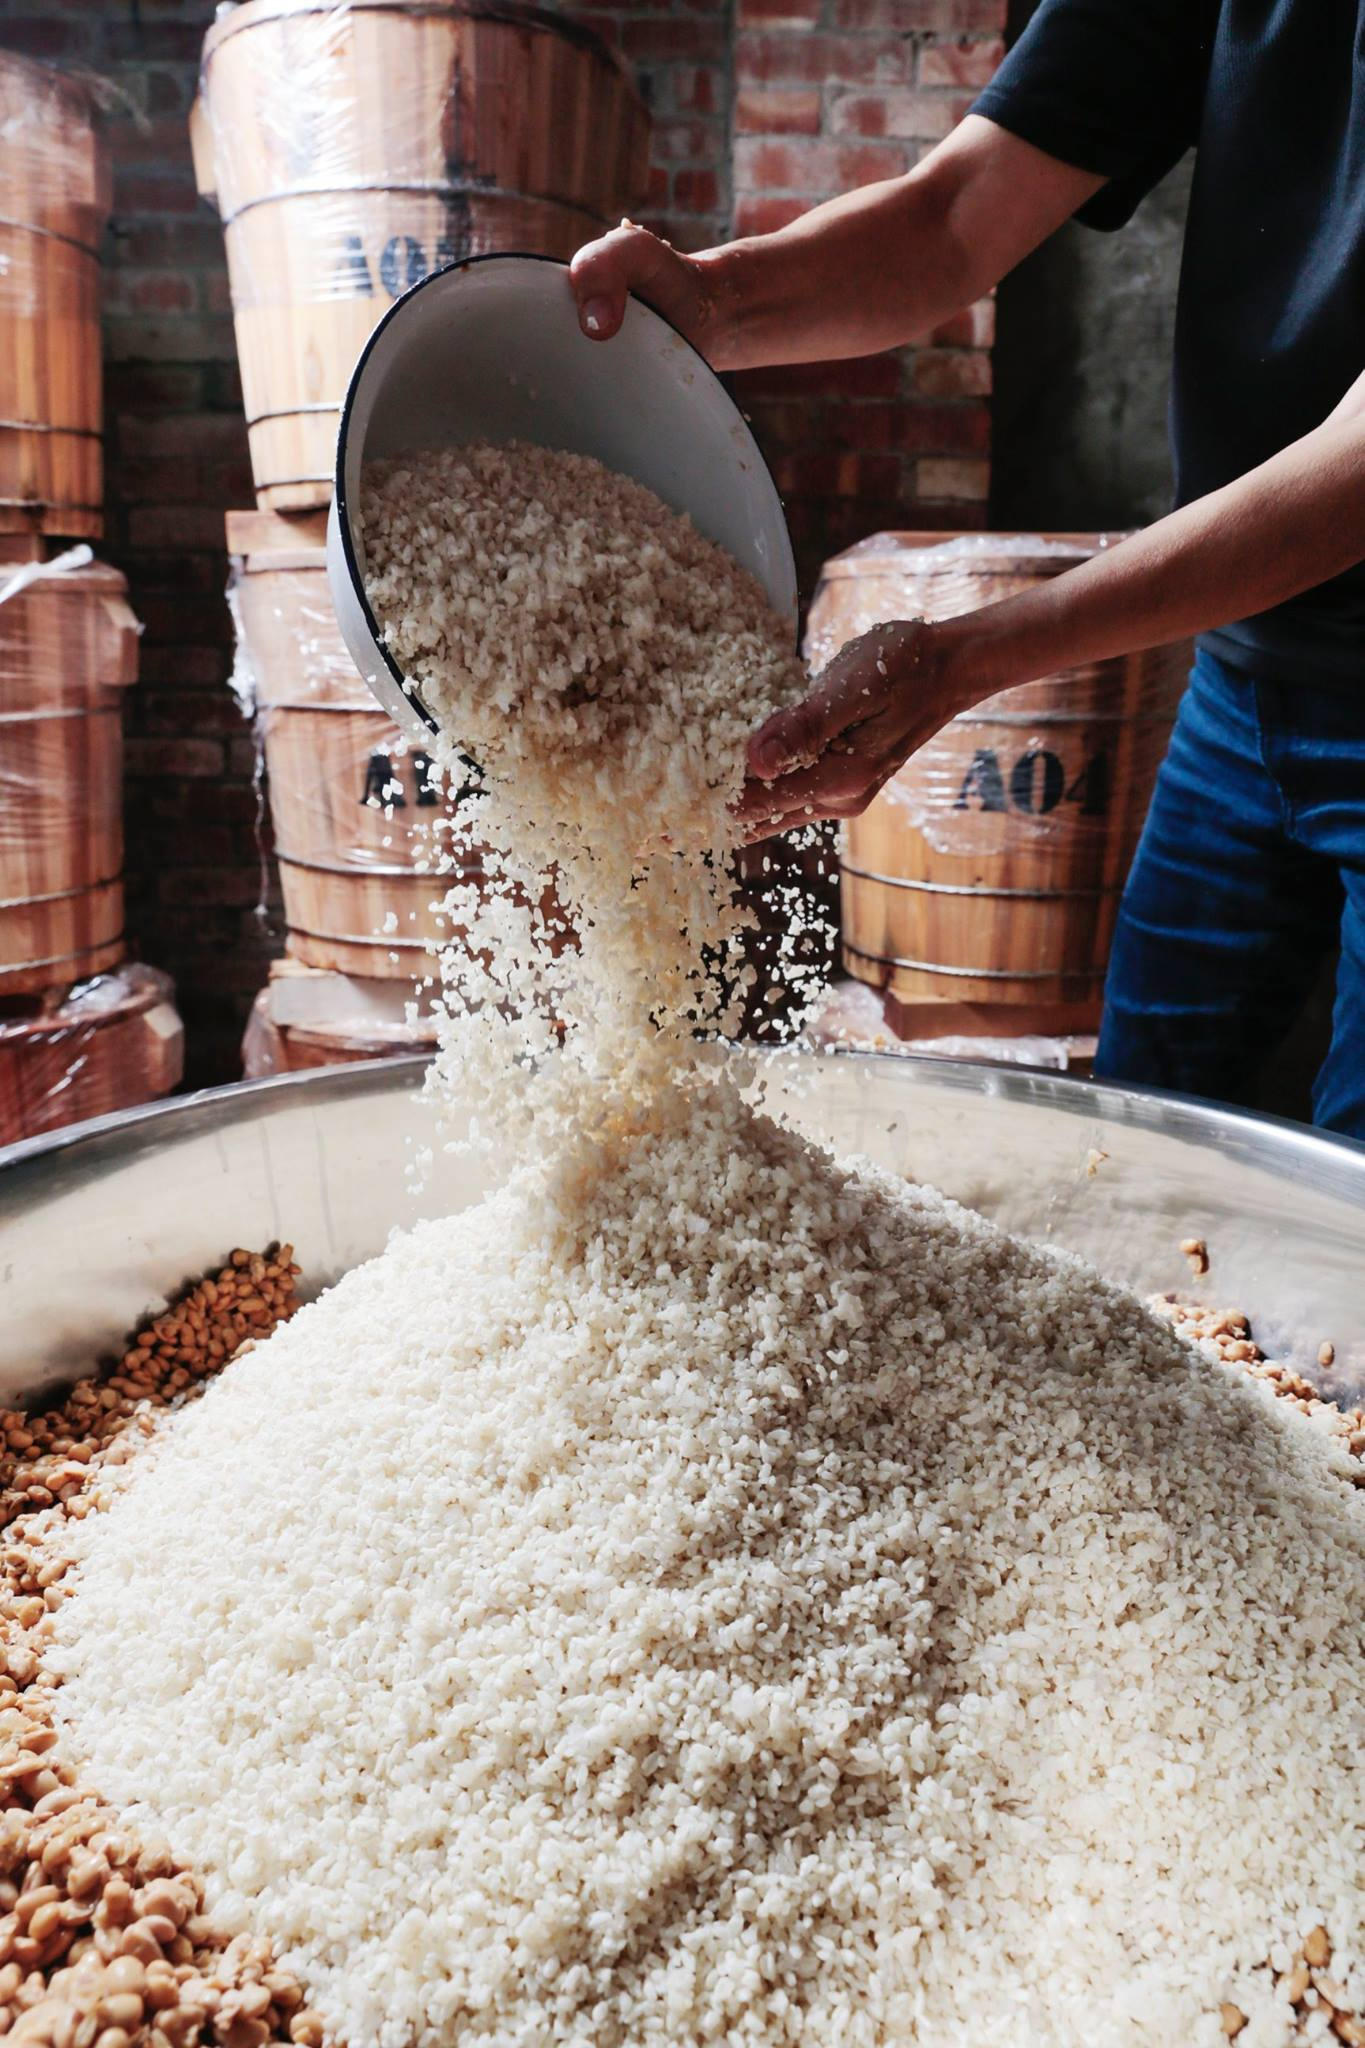 make naturally fermented foods | Taiwan natural soy milk shop | HIDEKAWA